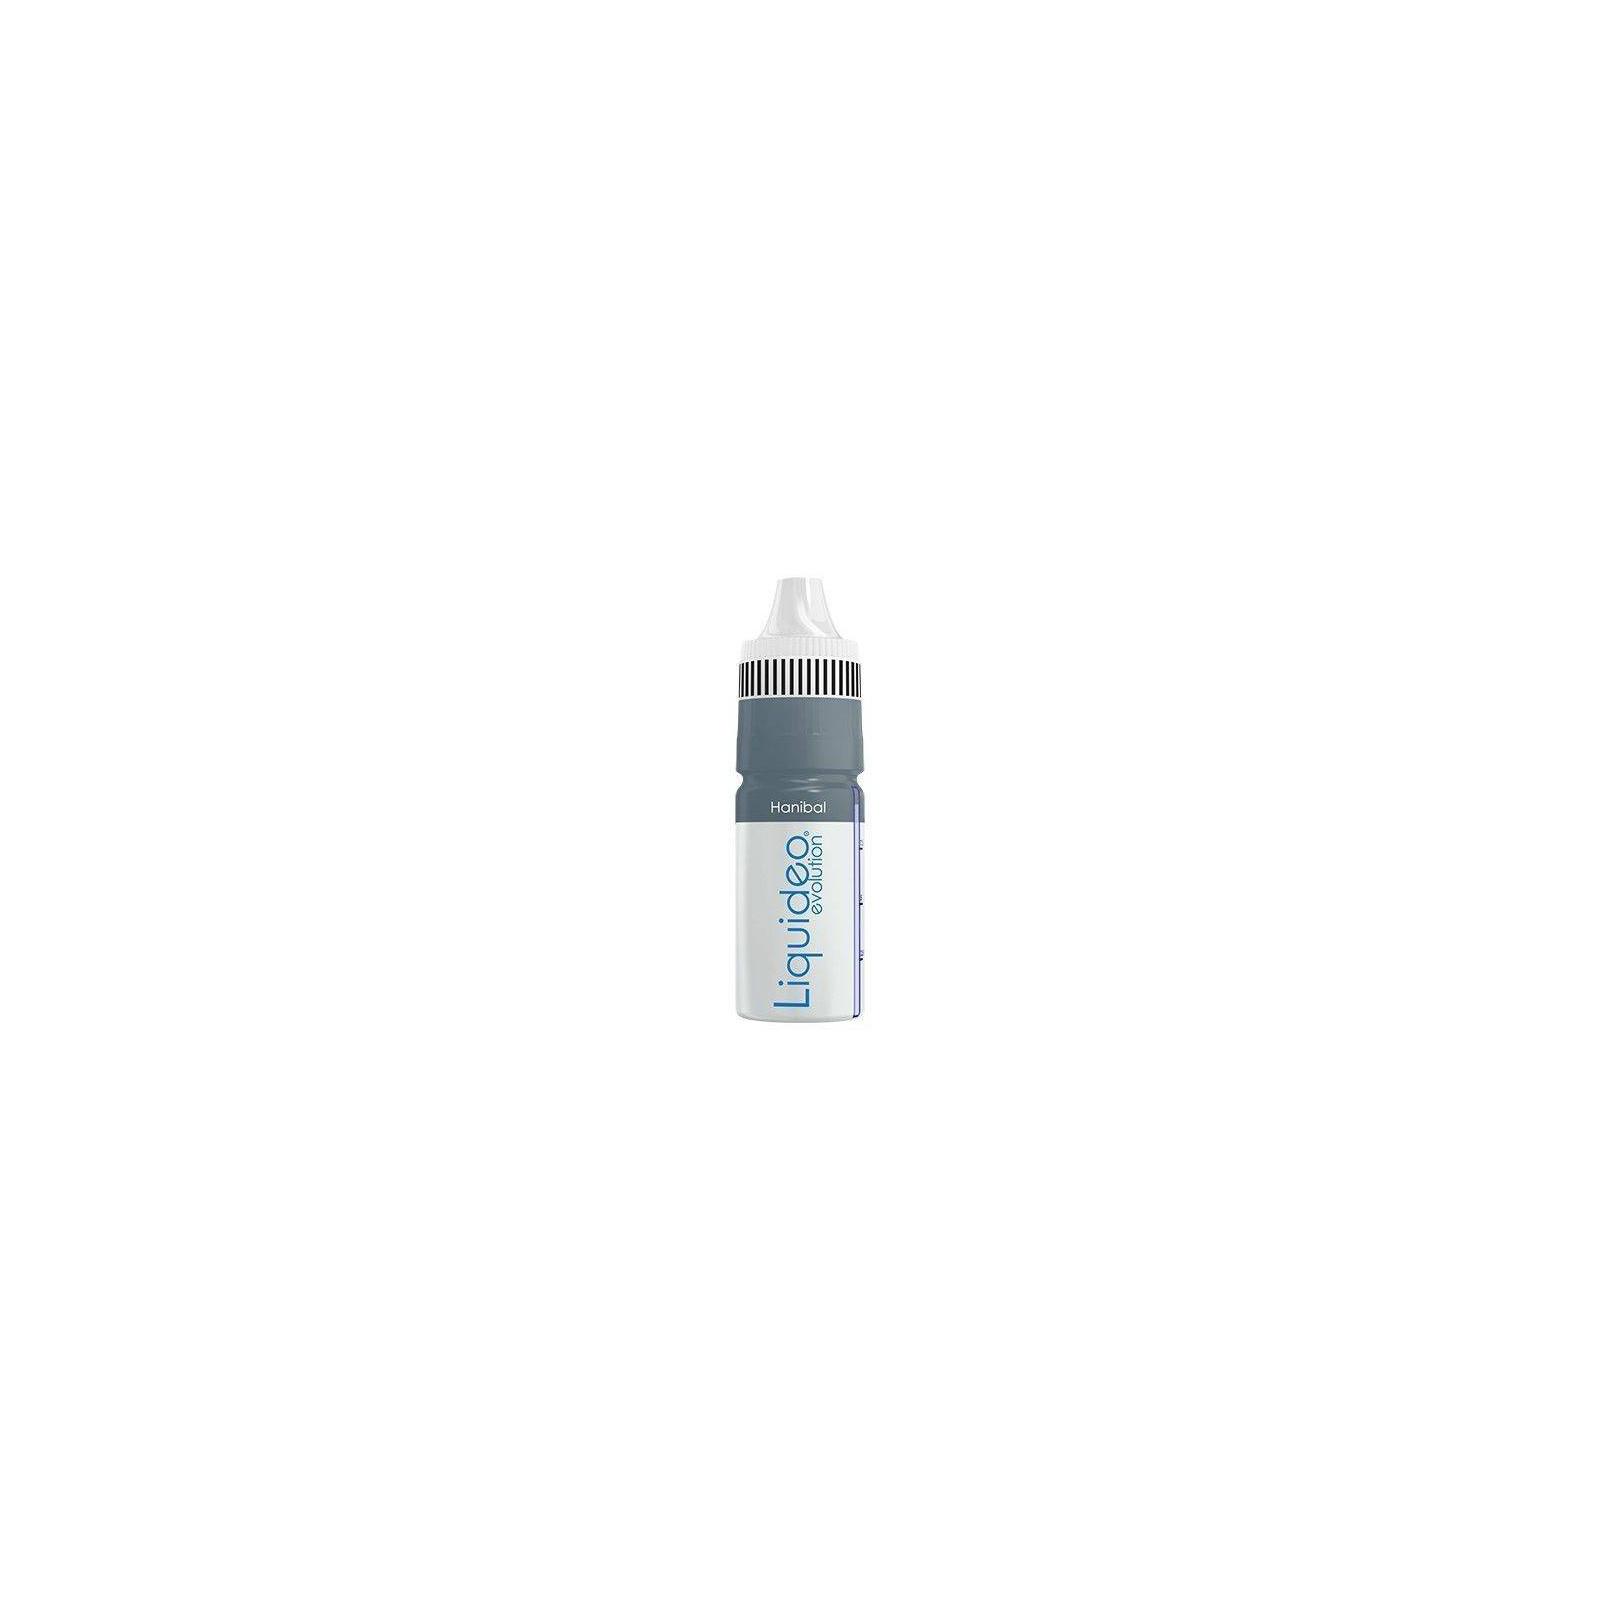 Hanibal - LIQUIDEO